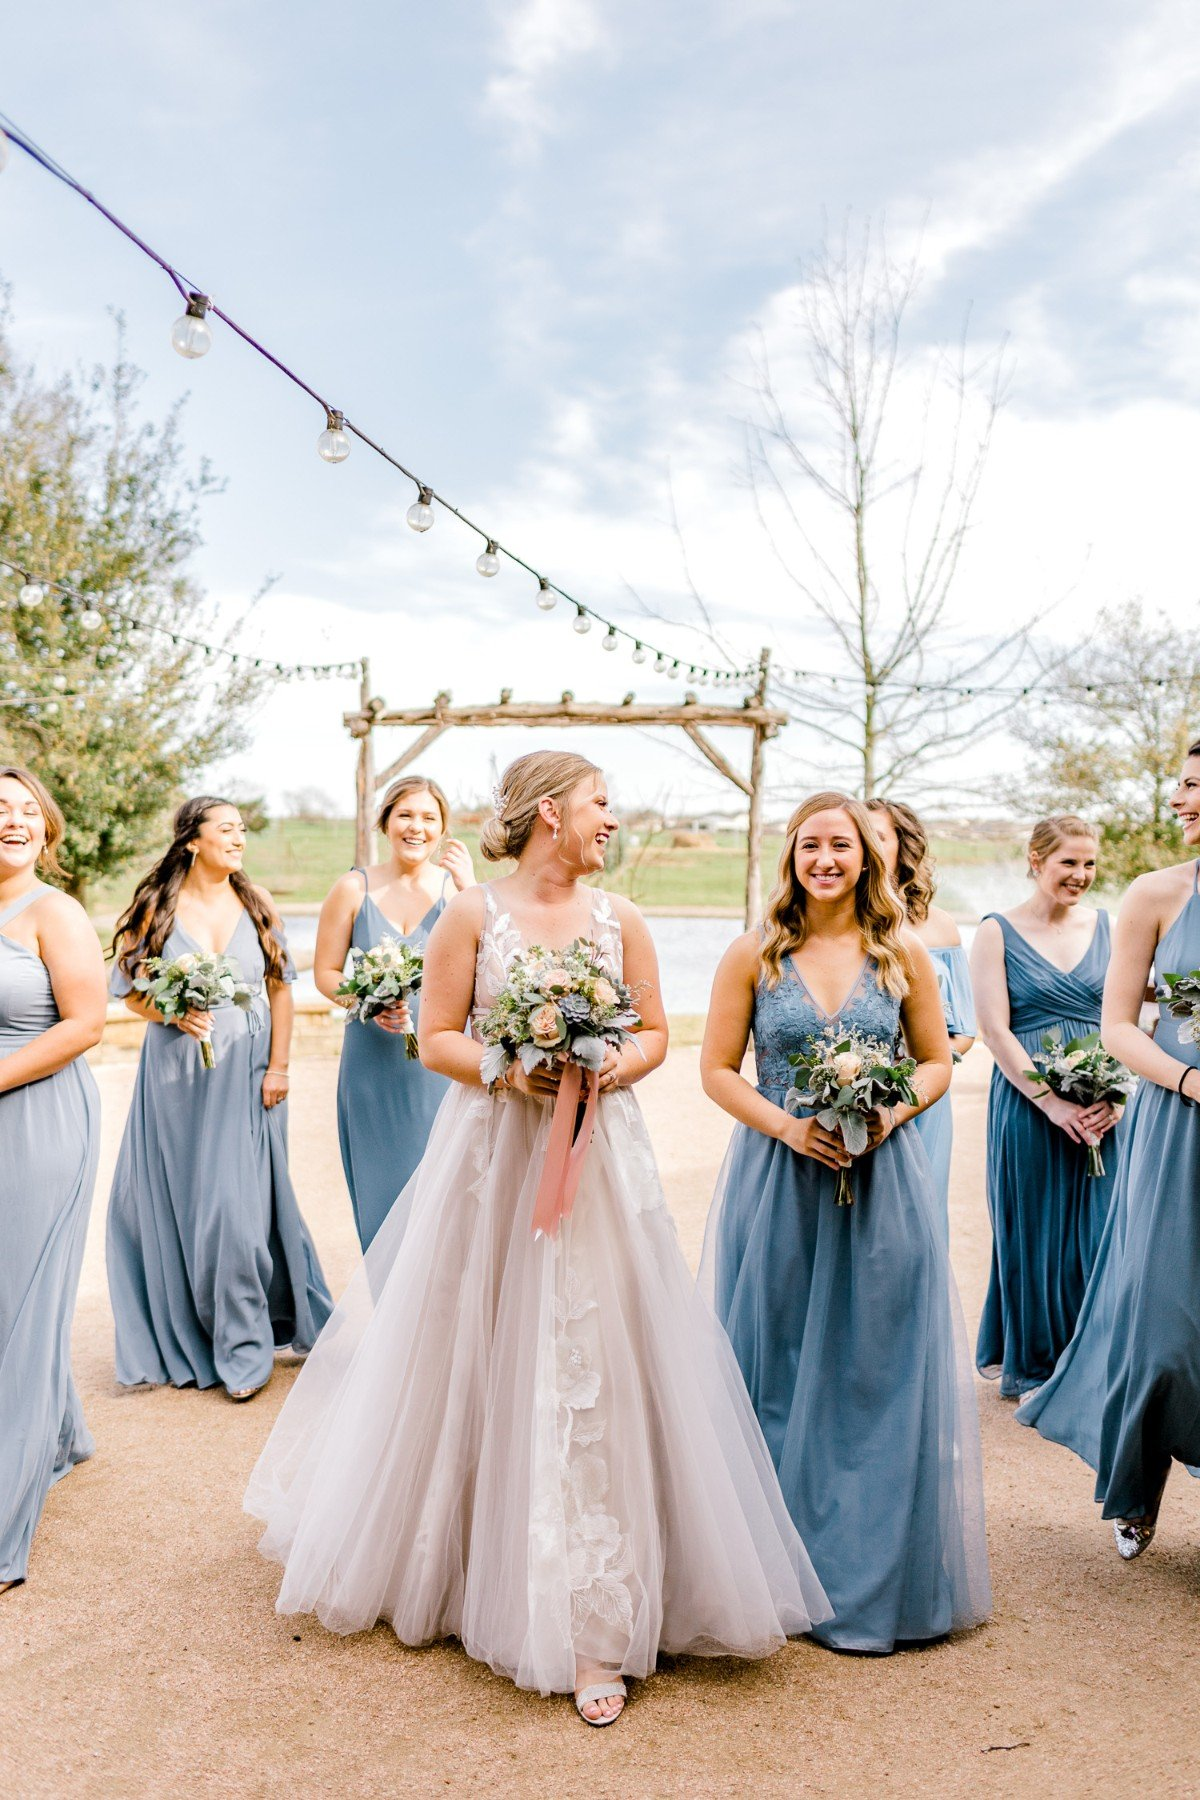 ennis-texas-wedding-photographer-kaitlyn-bullard-28.jpg